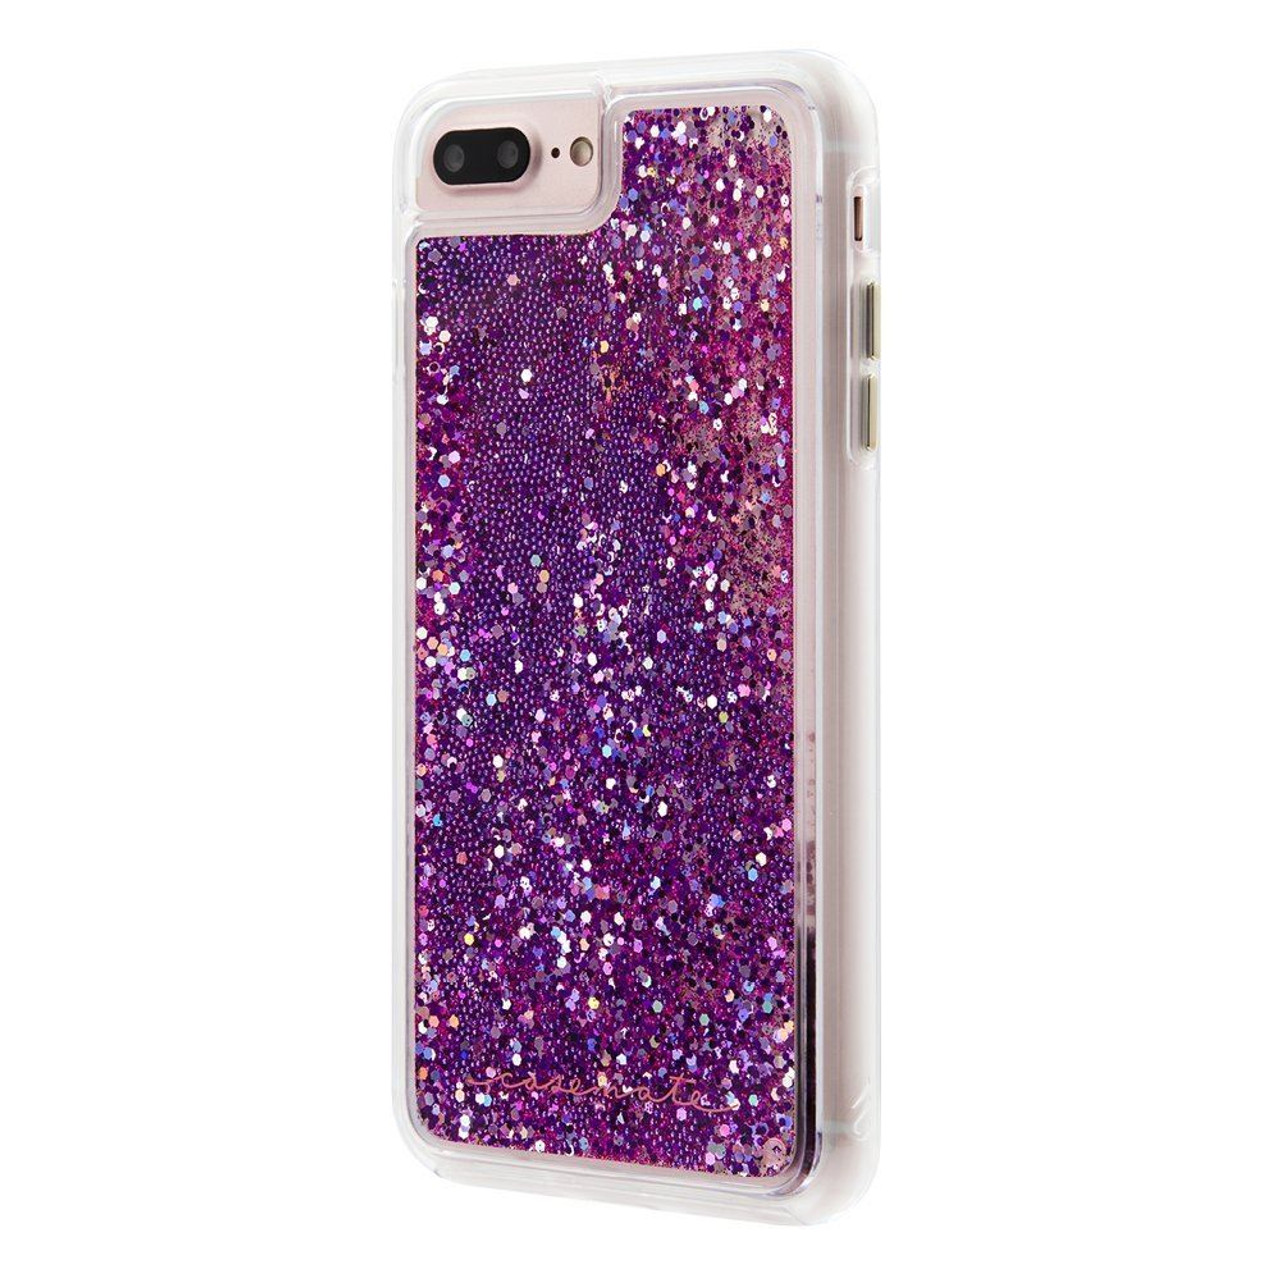 timeless design 276b1 80684 Case-Mate Waterfall Glitter Case For iPhone 8 Plus / 7 Plus / 6 Plus -  Magenta